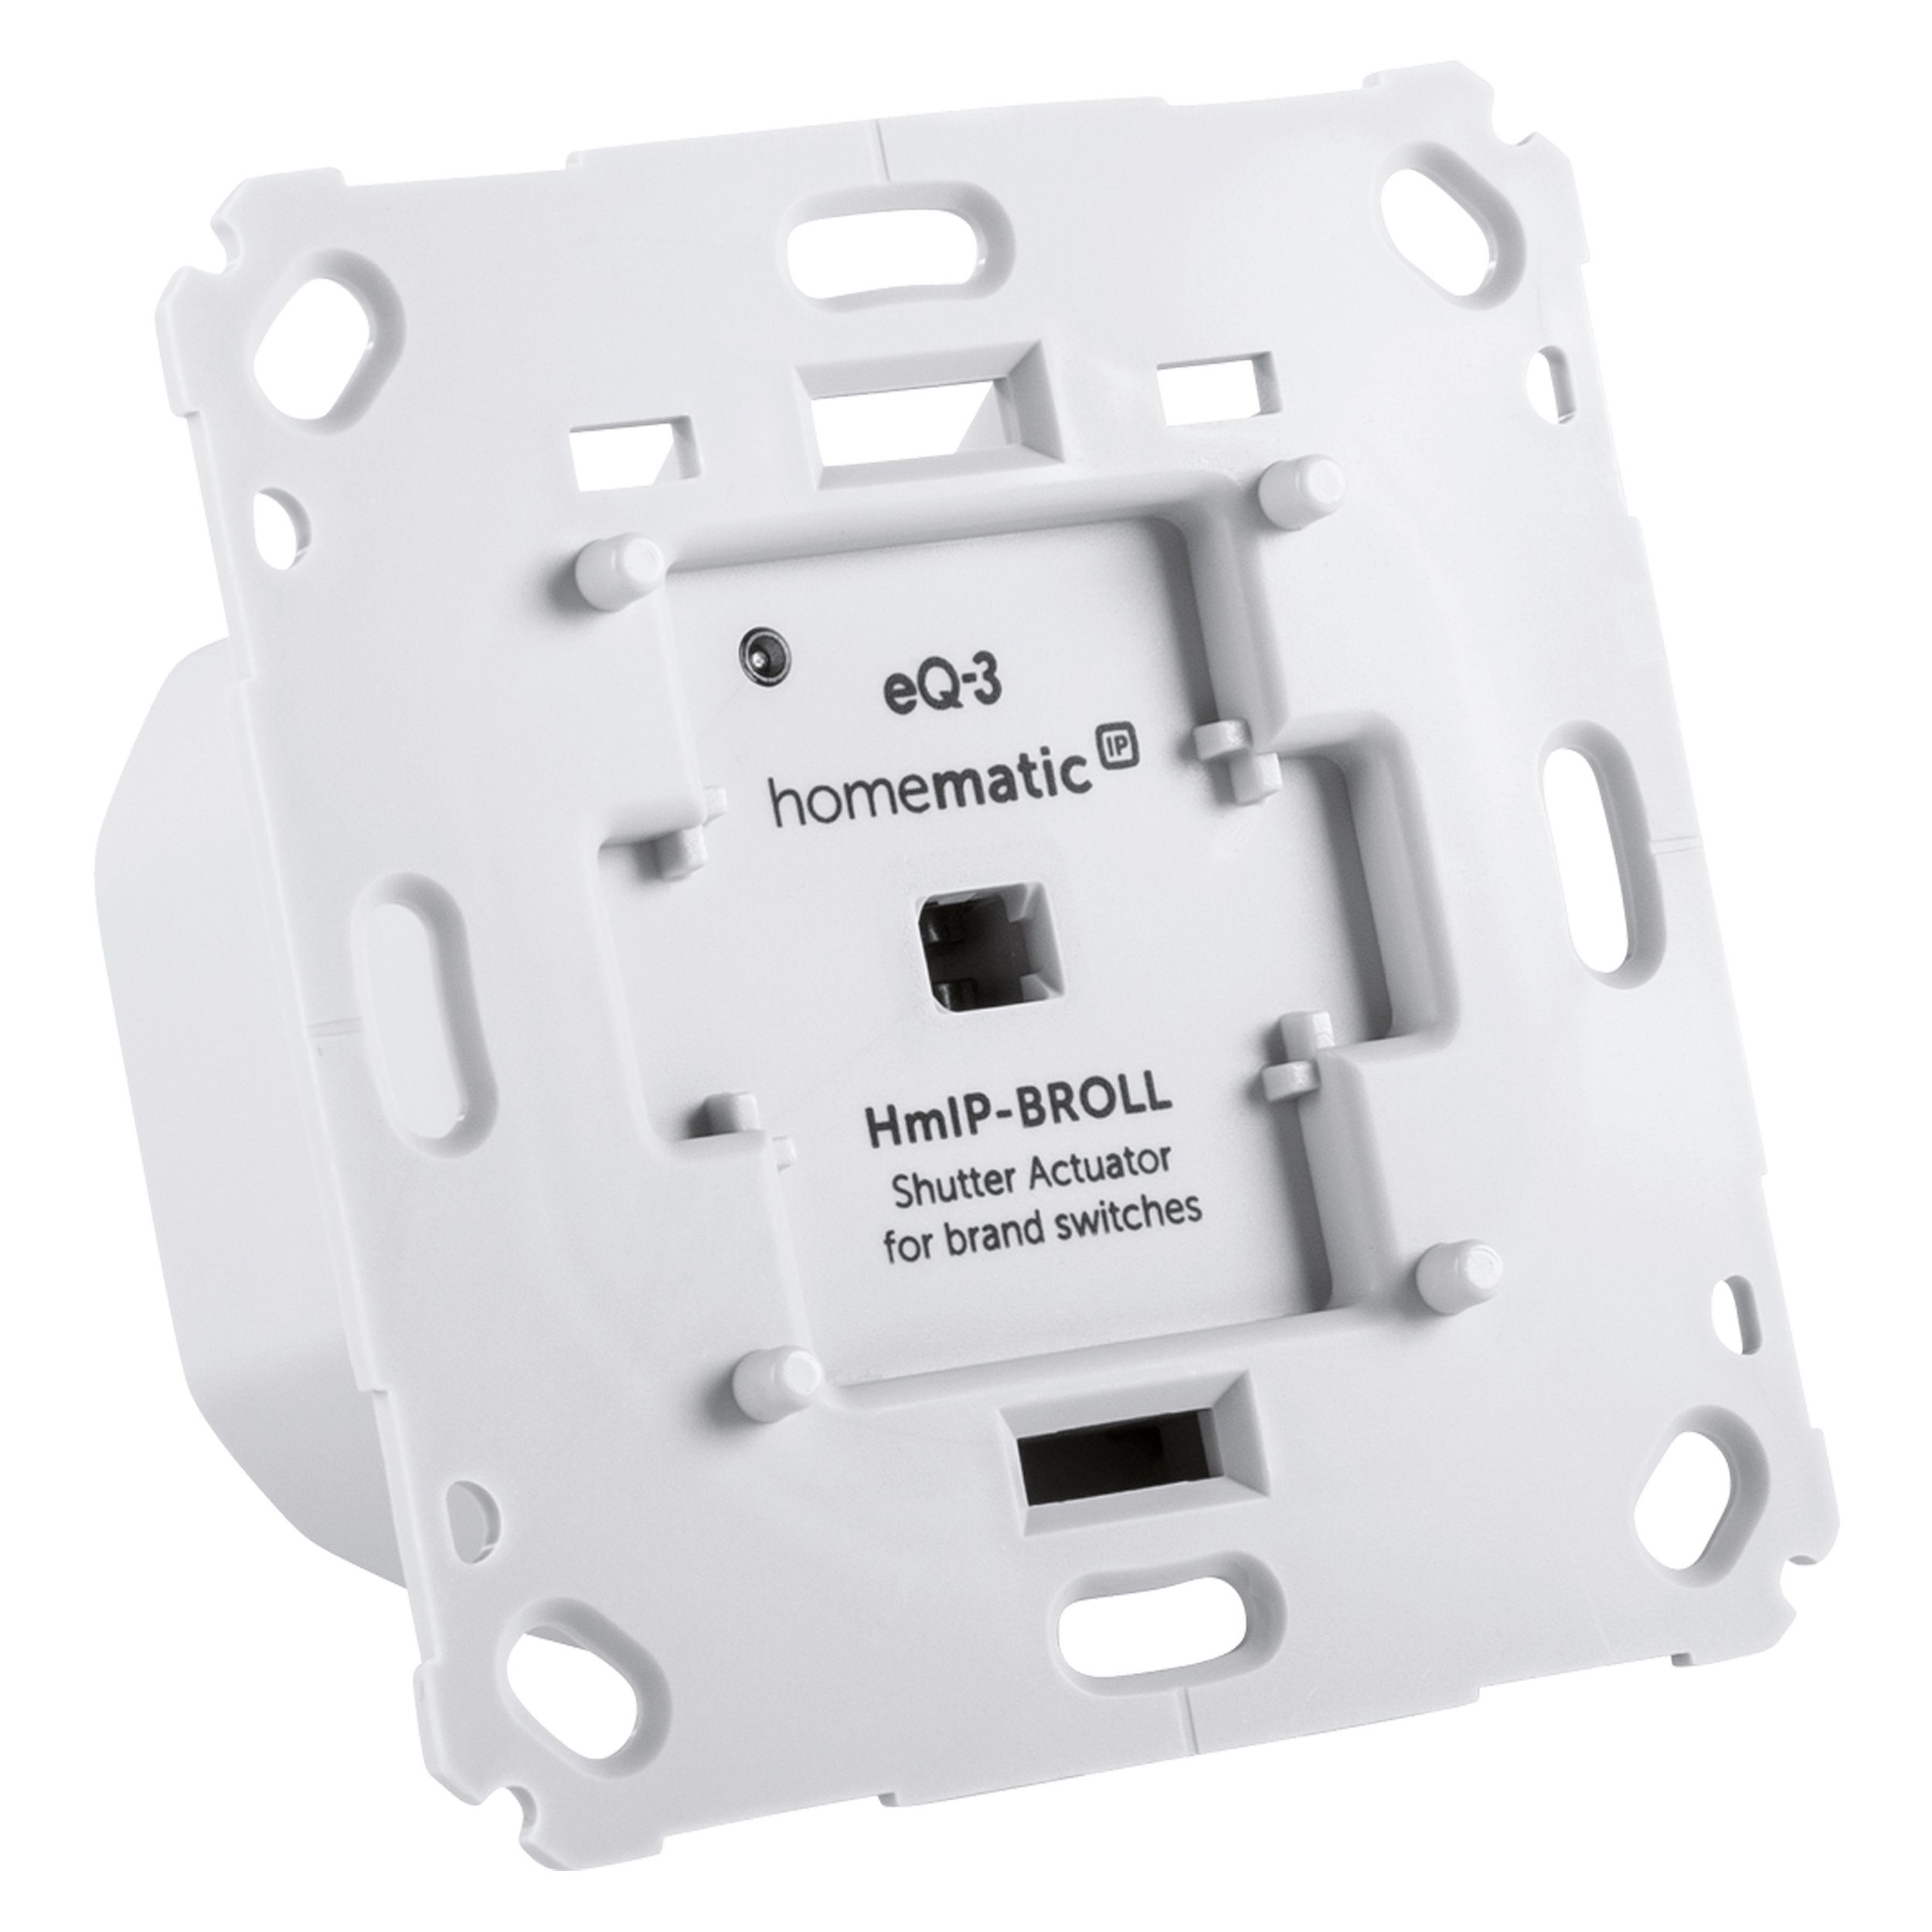 Homematic IP Smart Home - Raumklima & Komfort »Rollladenaktor für Markenschalter - HmIP-BROLL«